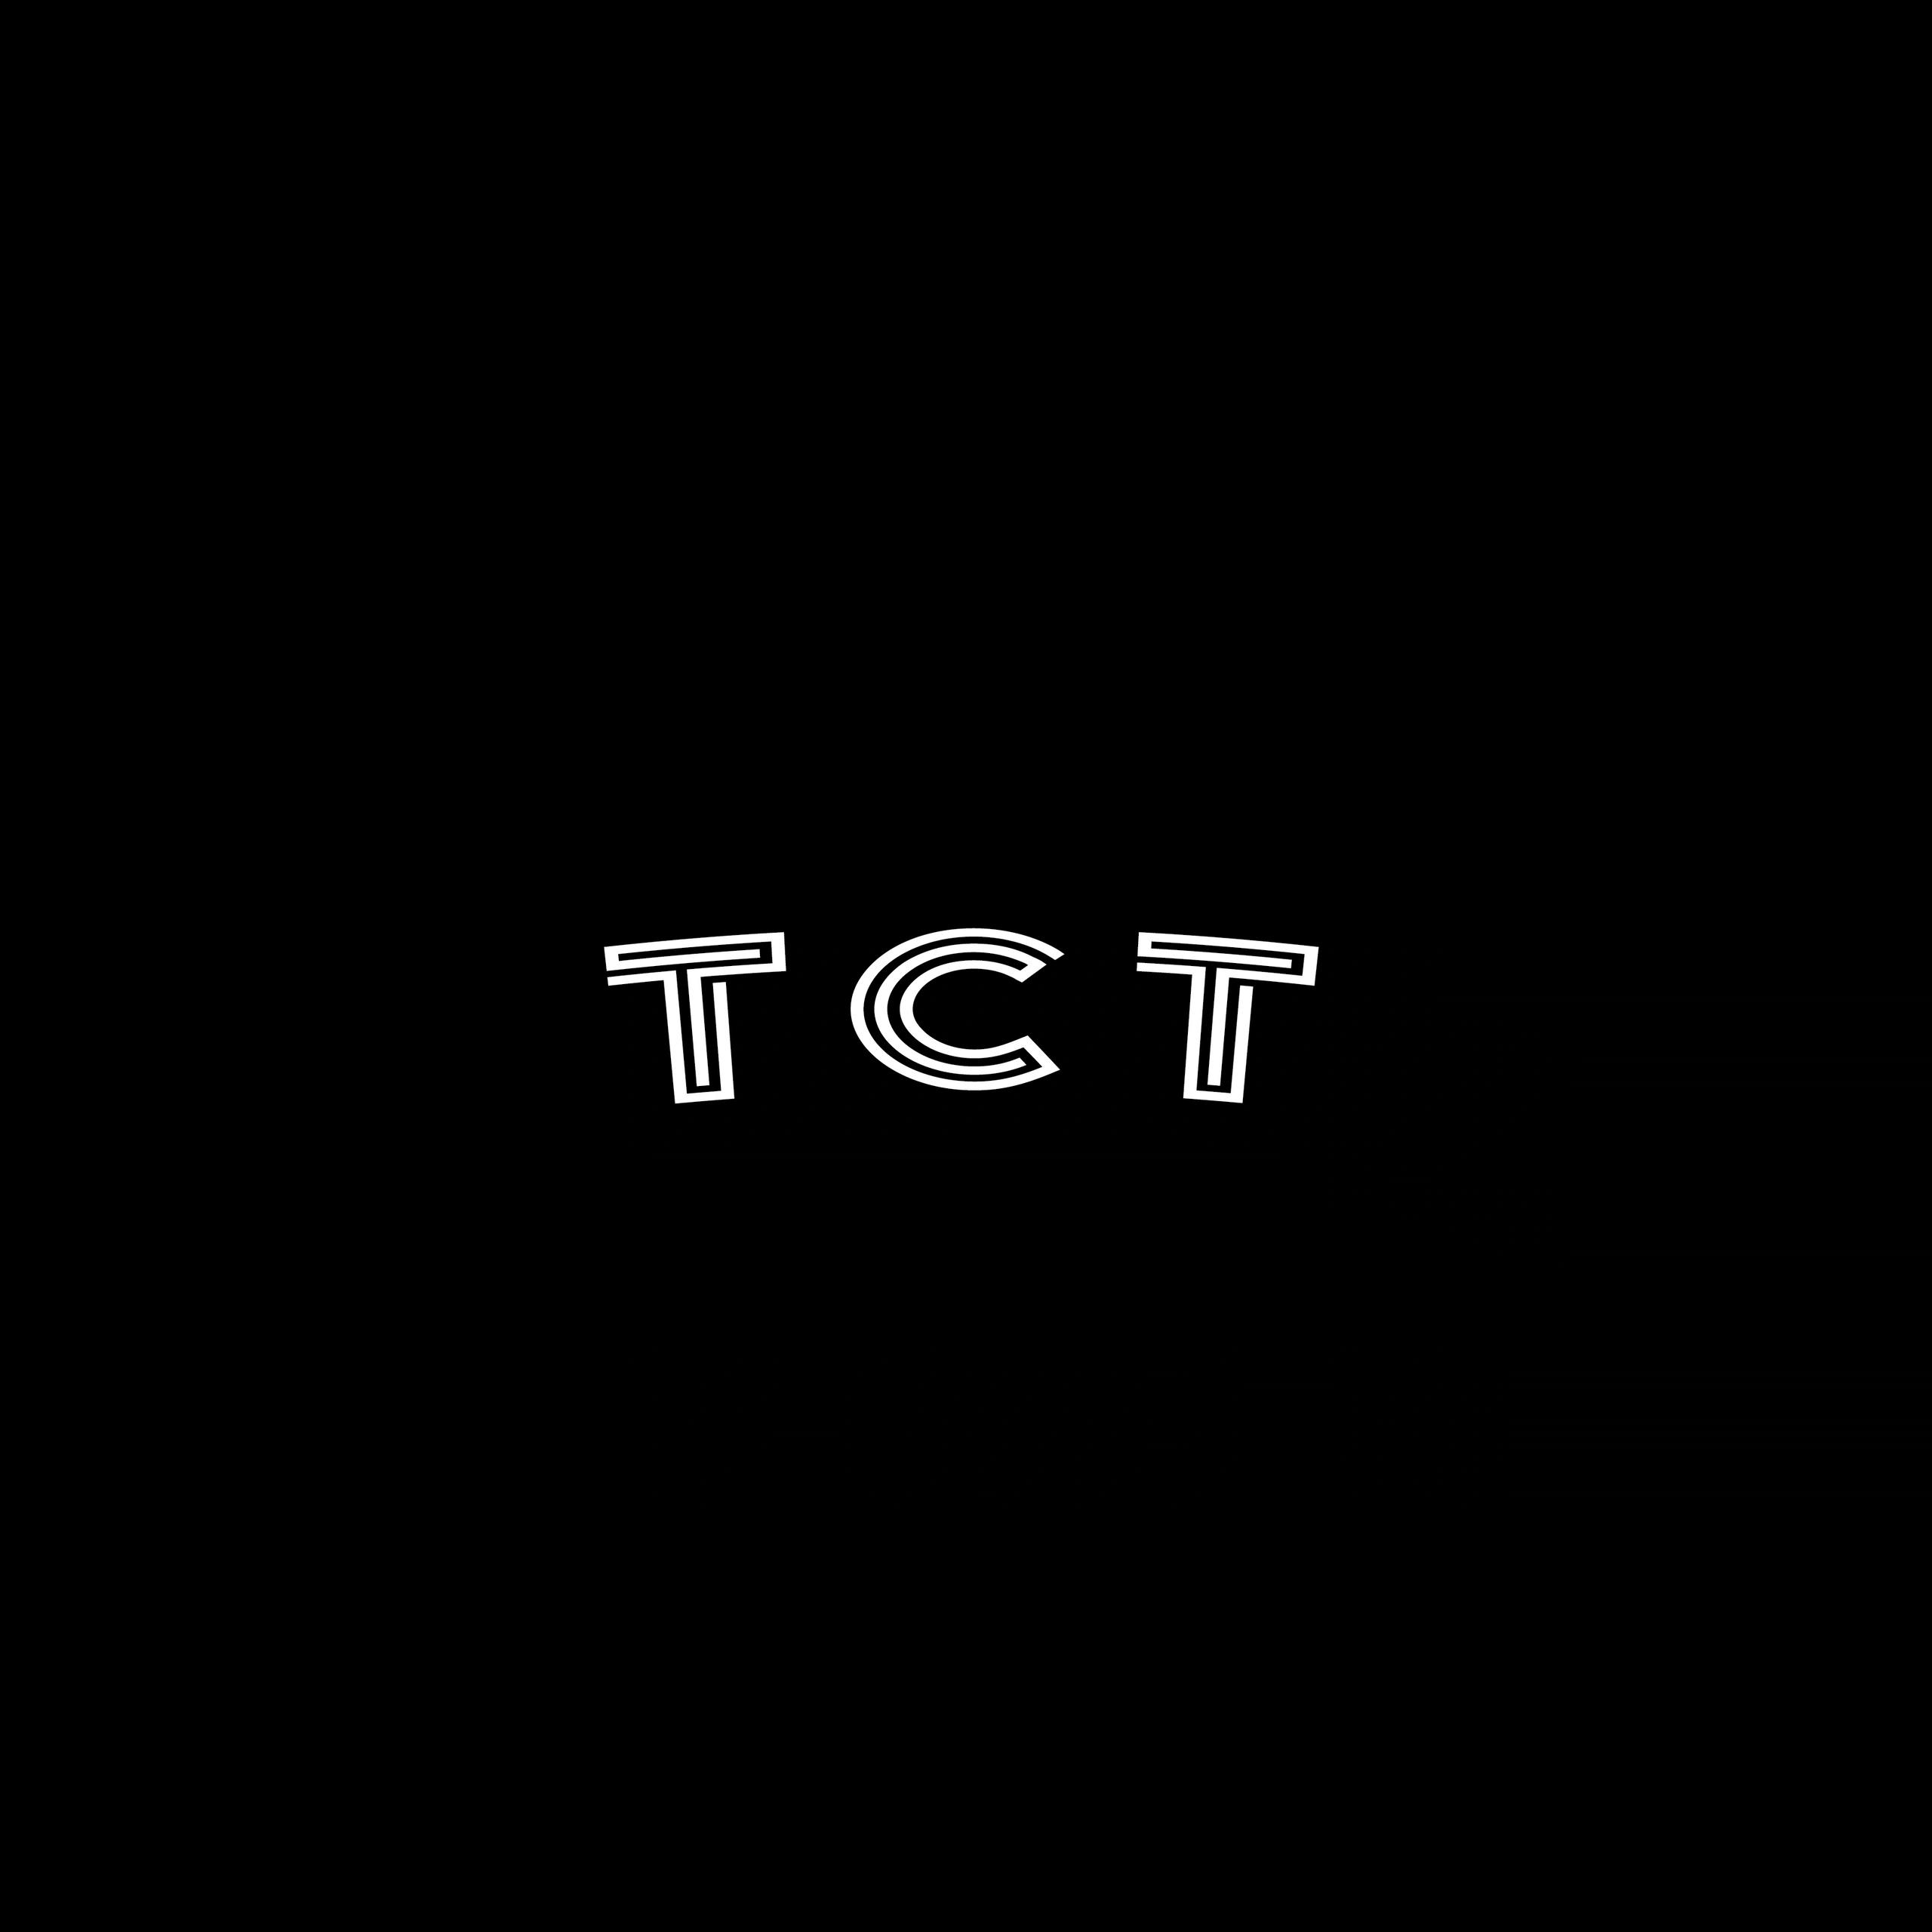 (c) Timothycampbell.ca